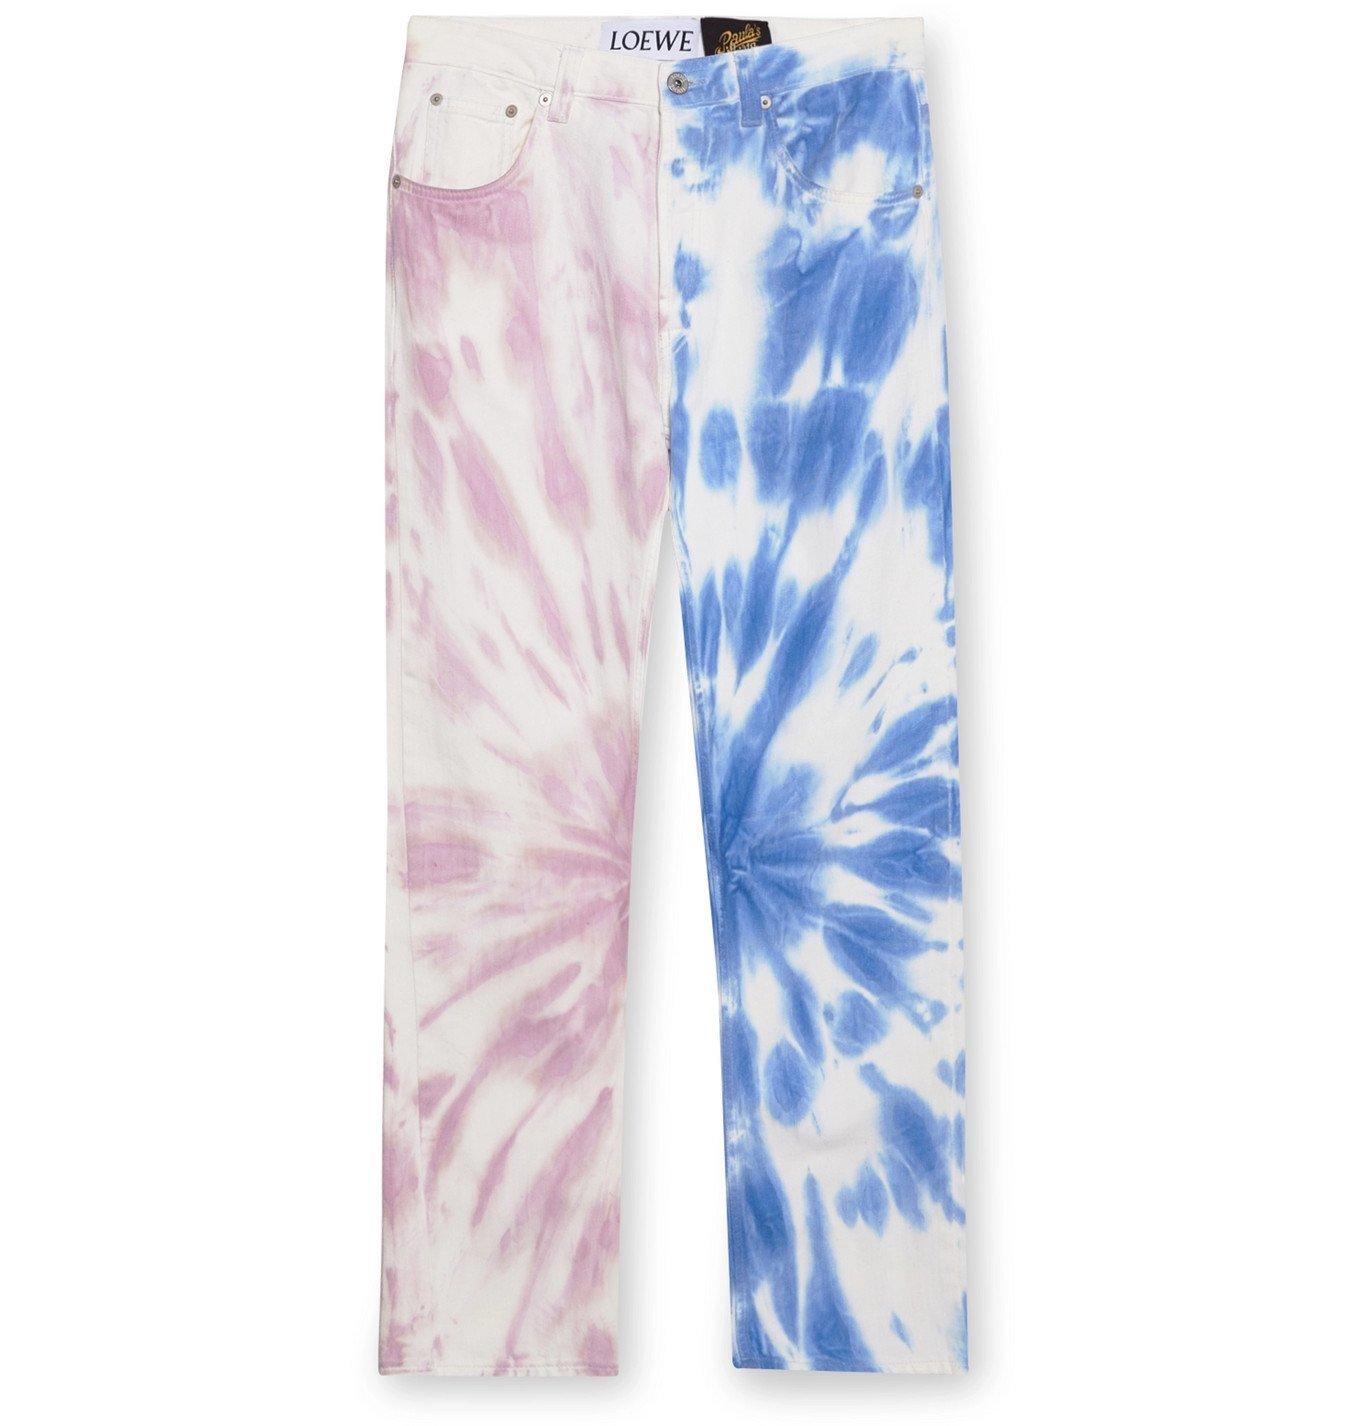 Photo: Loewe - Paula's Ibiza Tie-Dyed Denim Jeans - Unknown